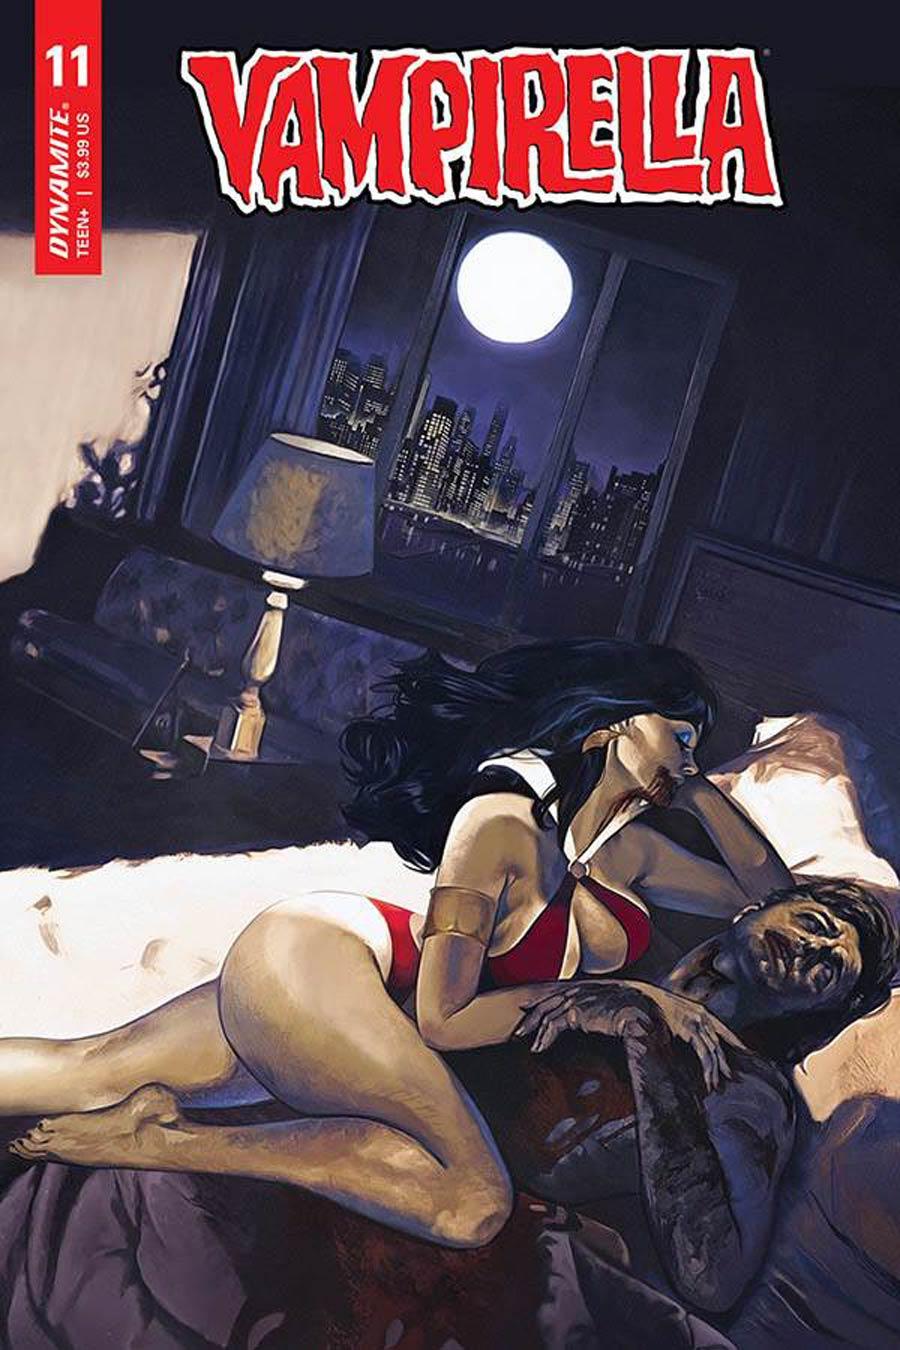 Vampirella Vol 8 #11 Cover C Variant Fay Dalton Cover